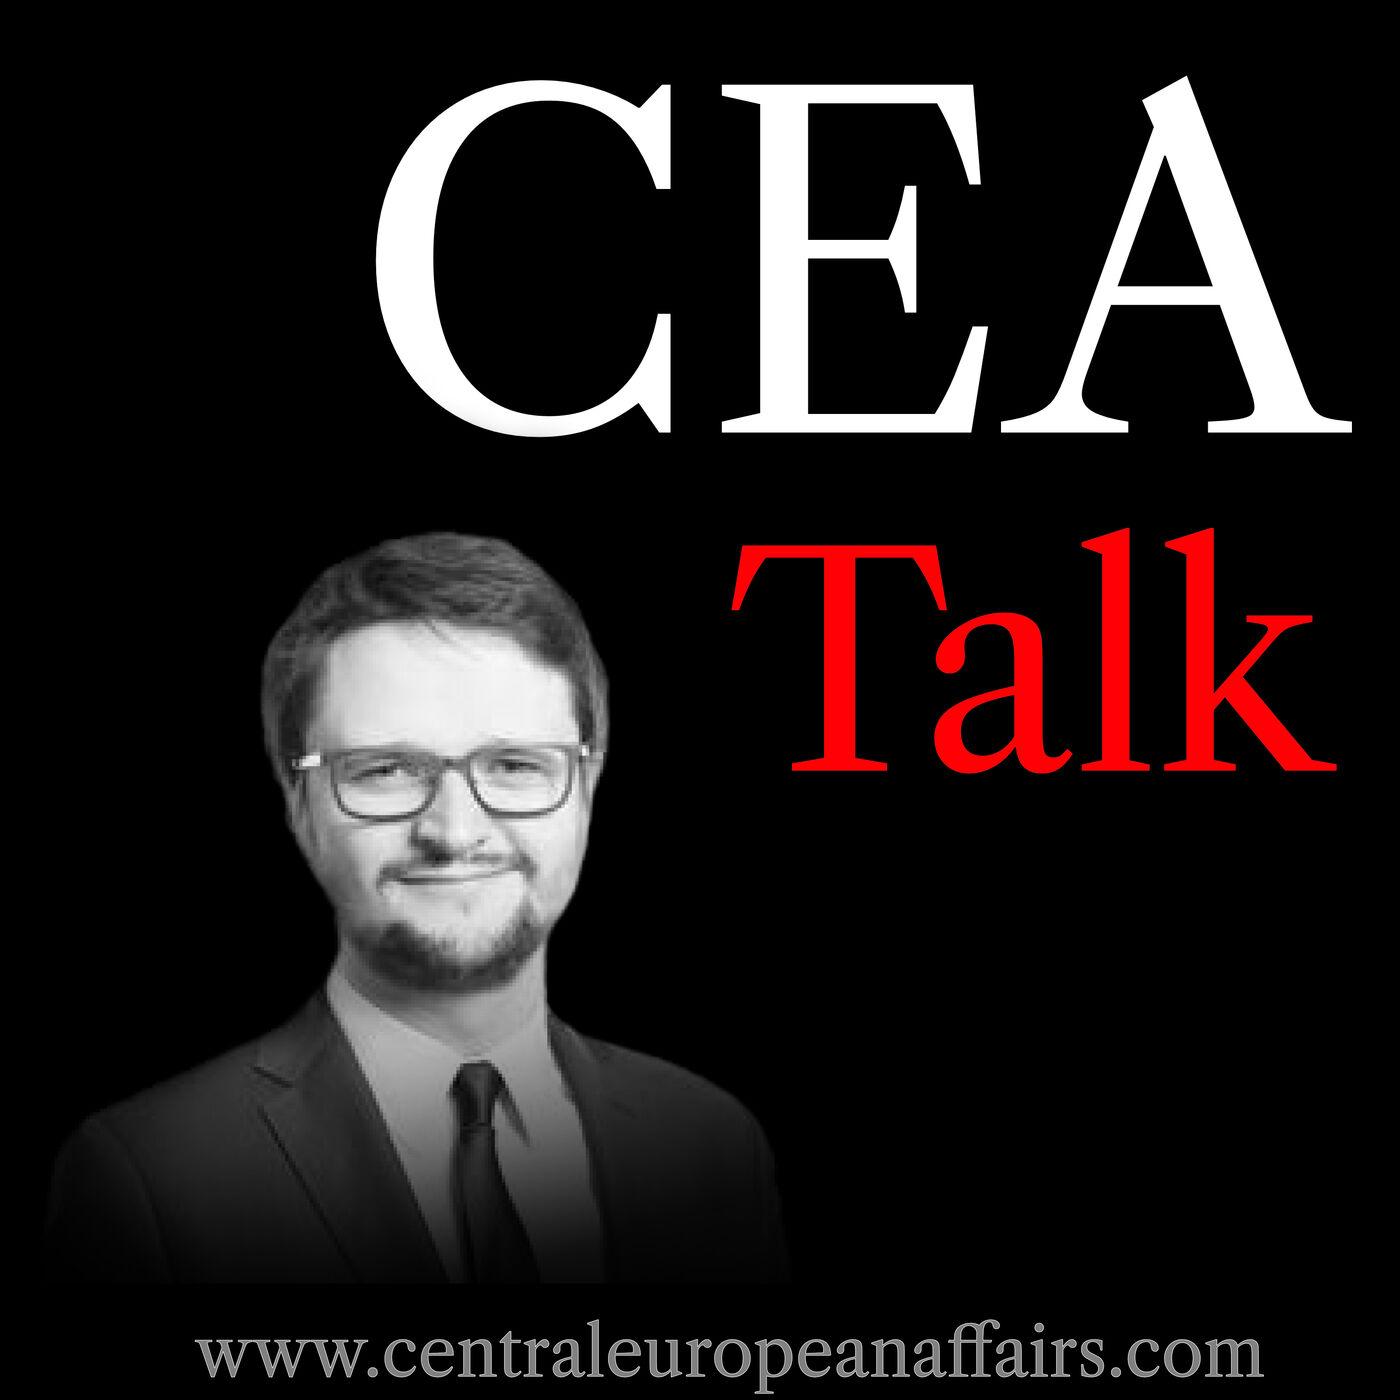 Tomaszevski: Russia's Kaliningrad project is back